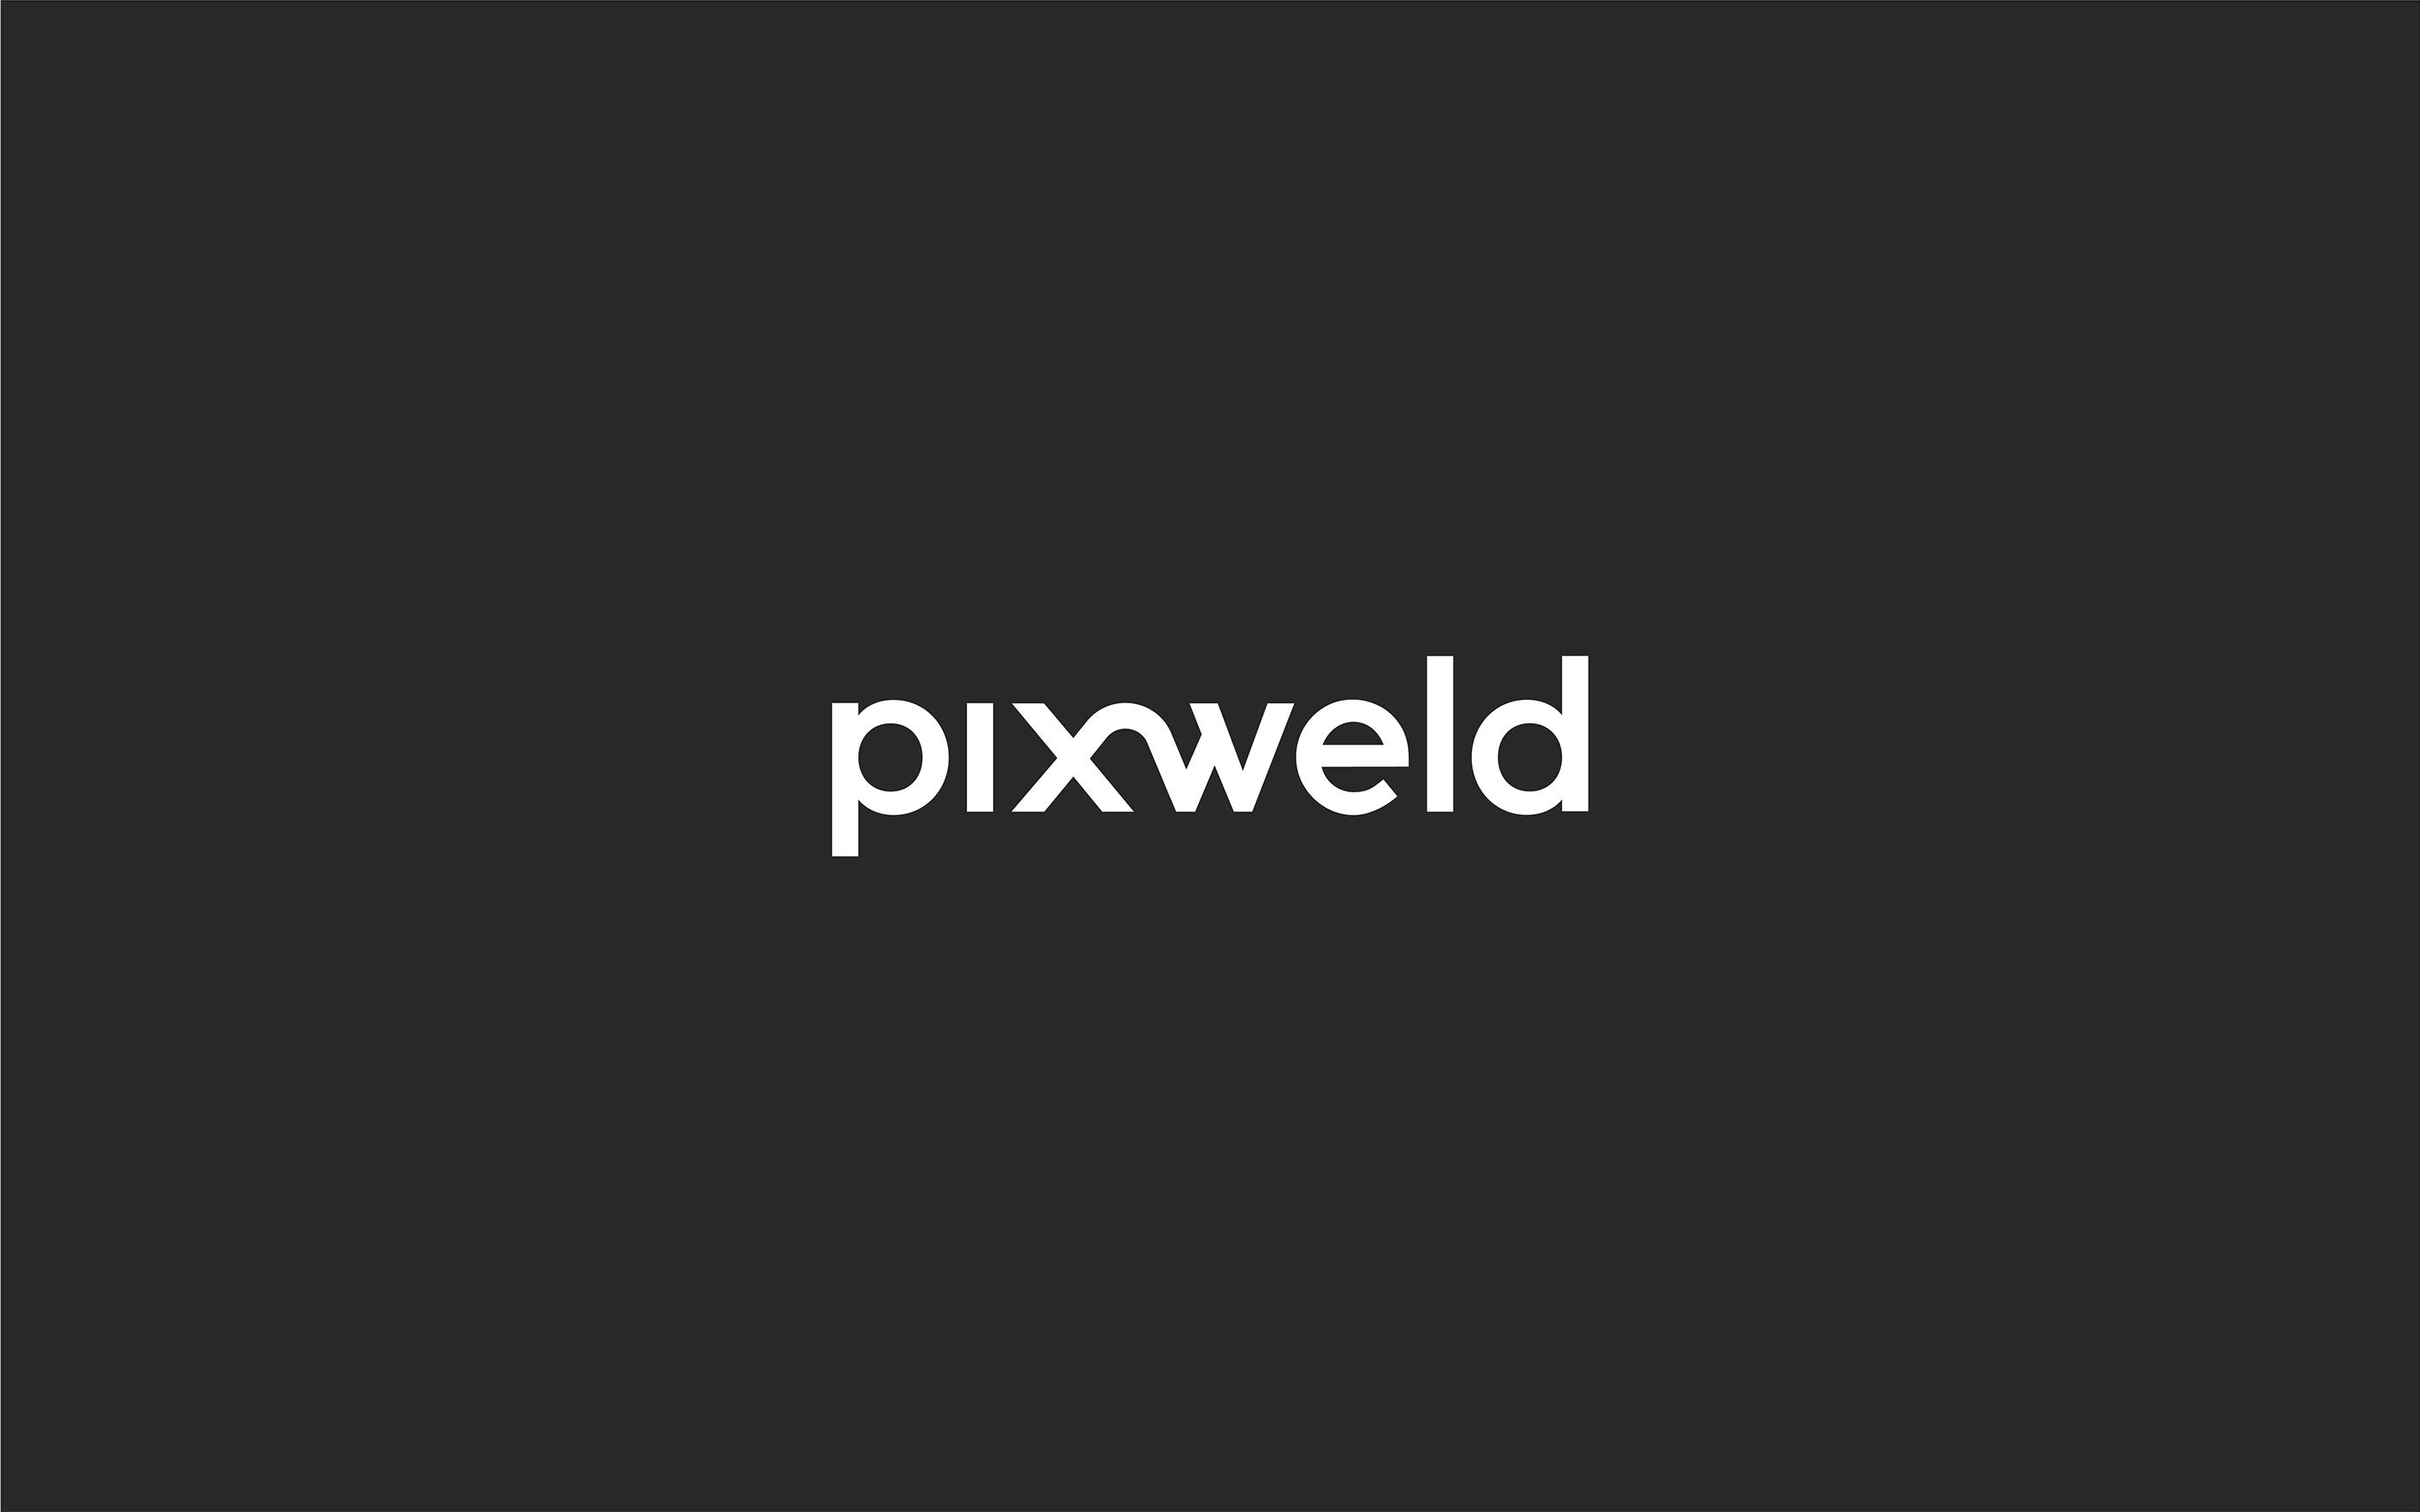 Pixweld 3D Visualisation Studio Branding – Identity Design